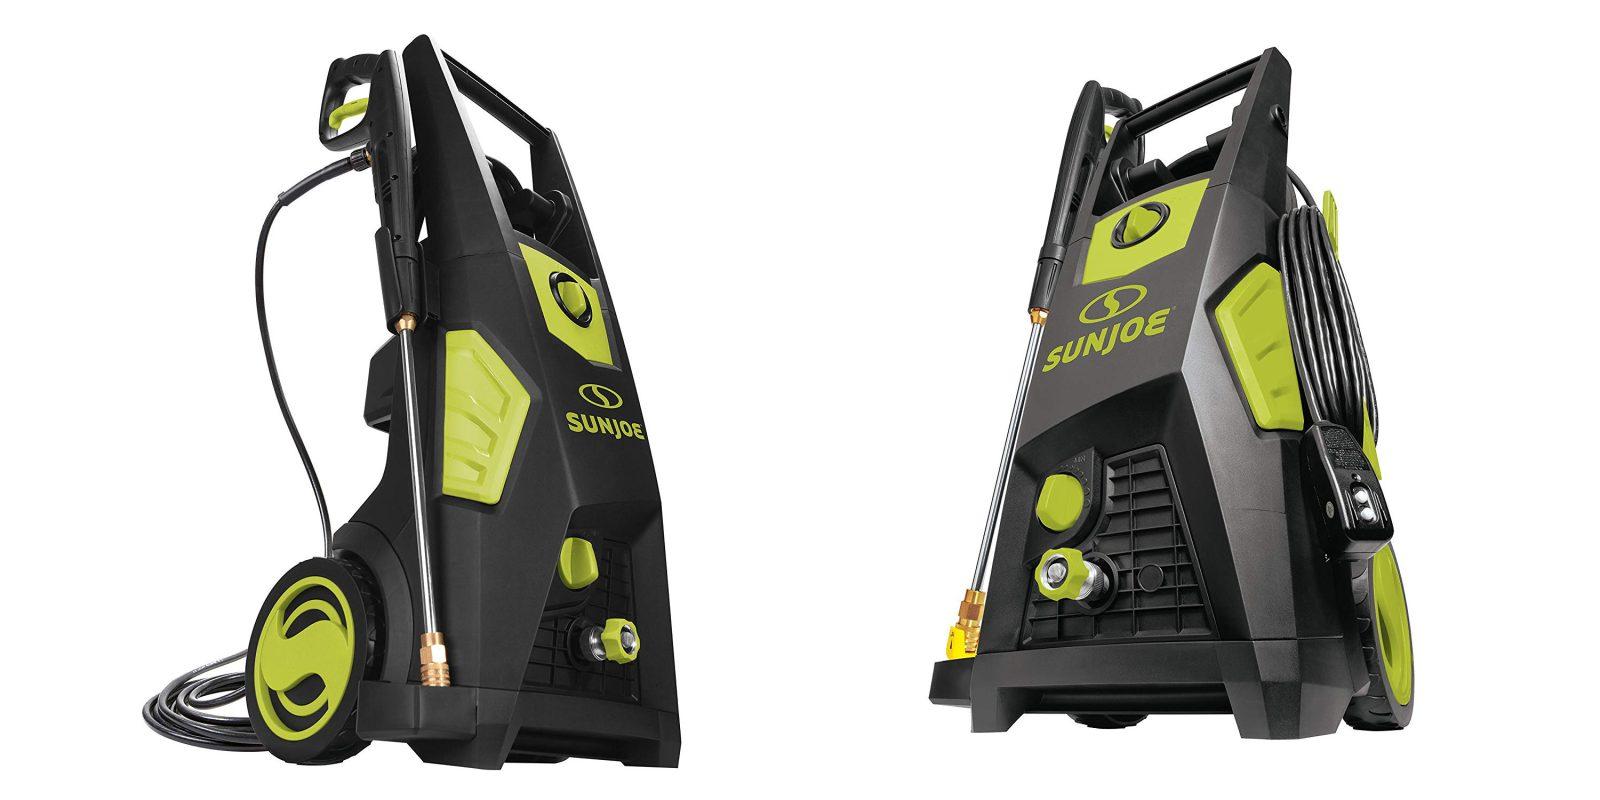 Sun Joe 2300-PSI Pressure Washer hits Amazon low: $159 (Reg